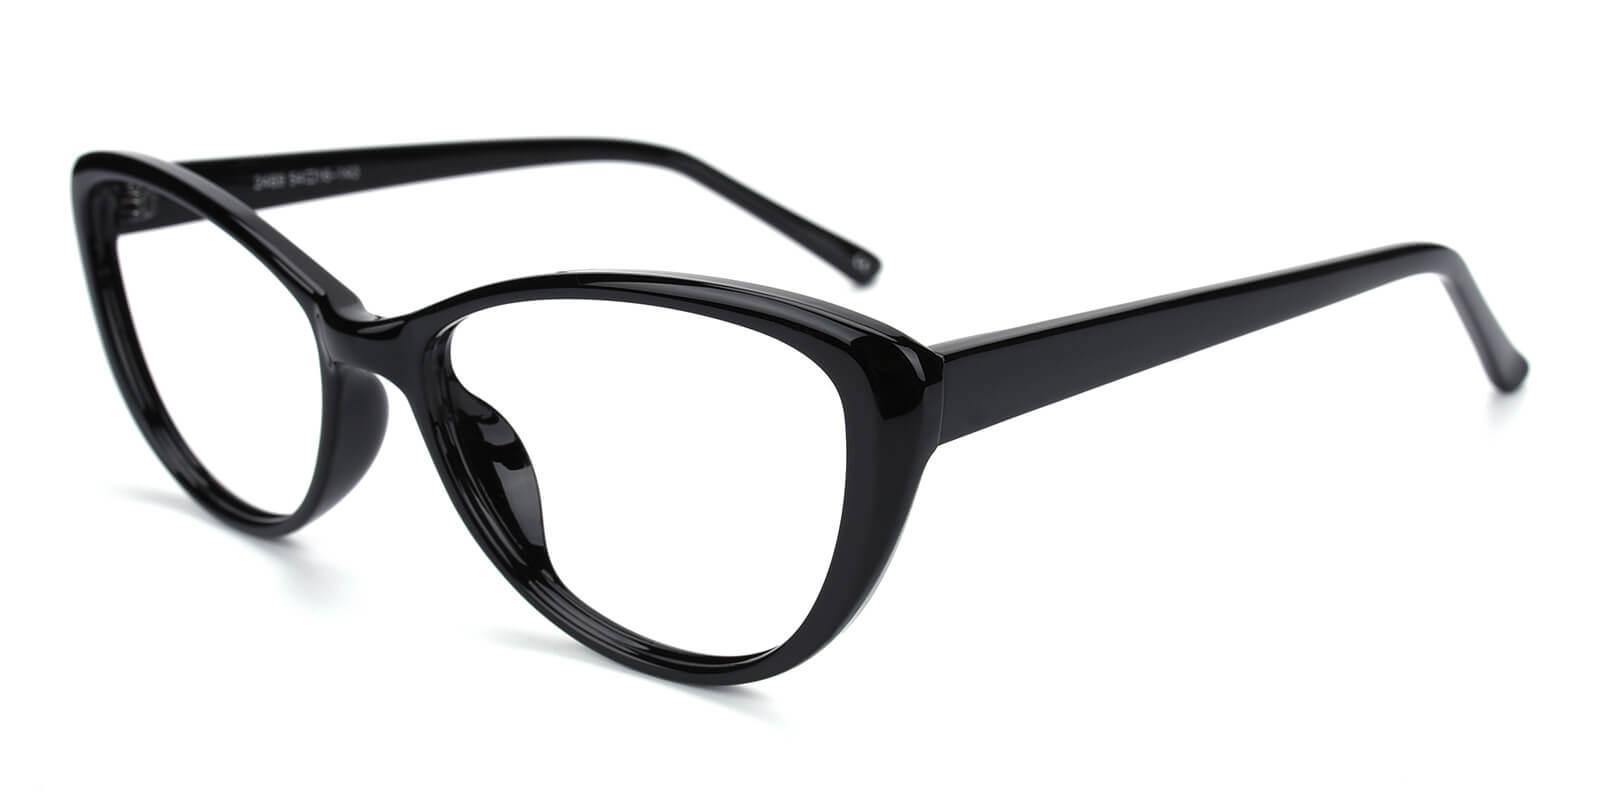 Slackey-Black-Oval / Cat-Acetate-Eyeglasses-additional1